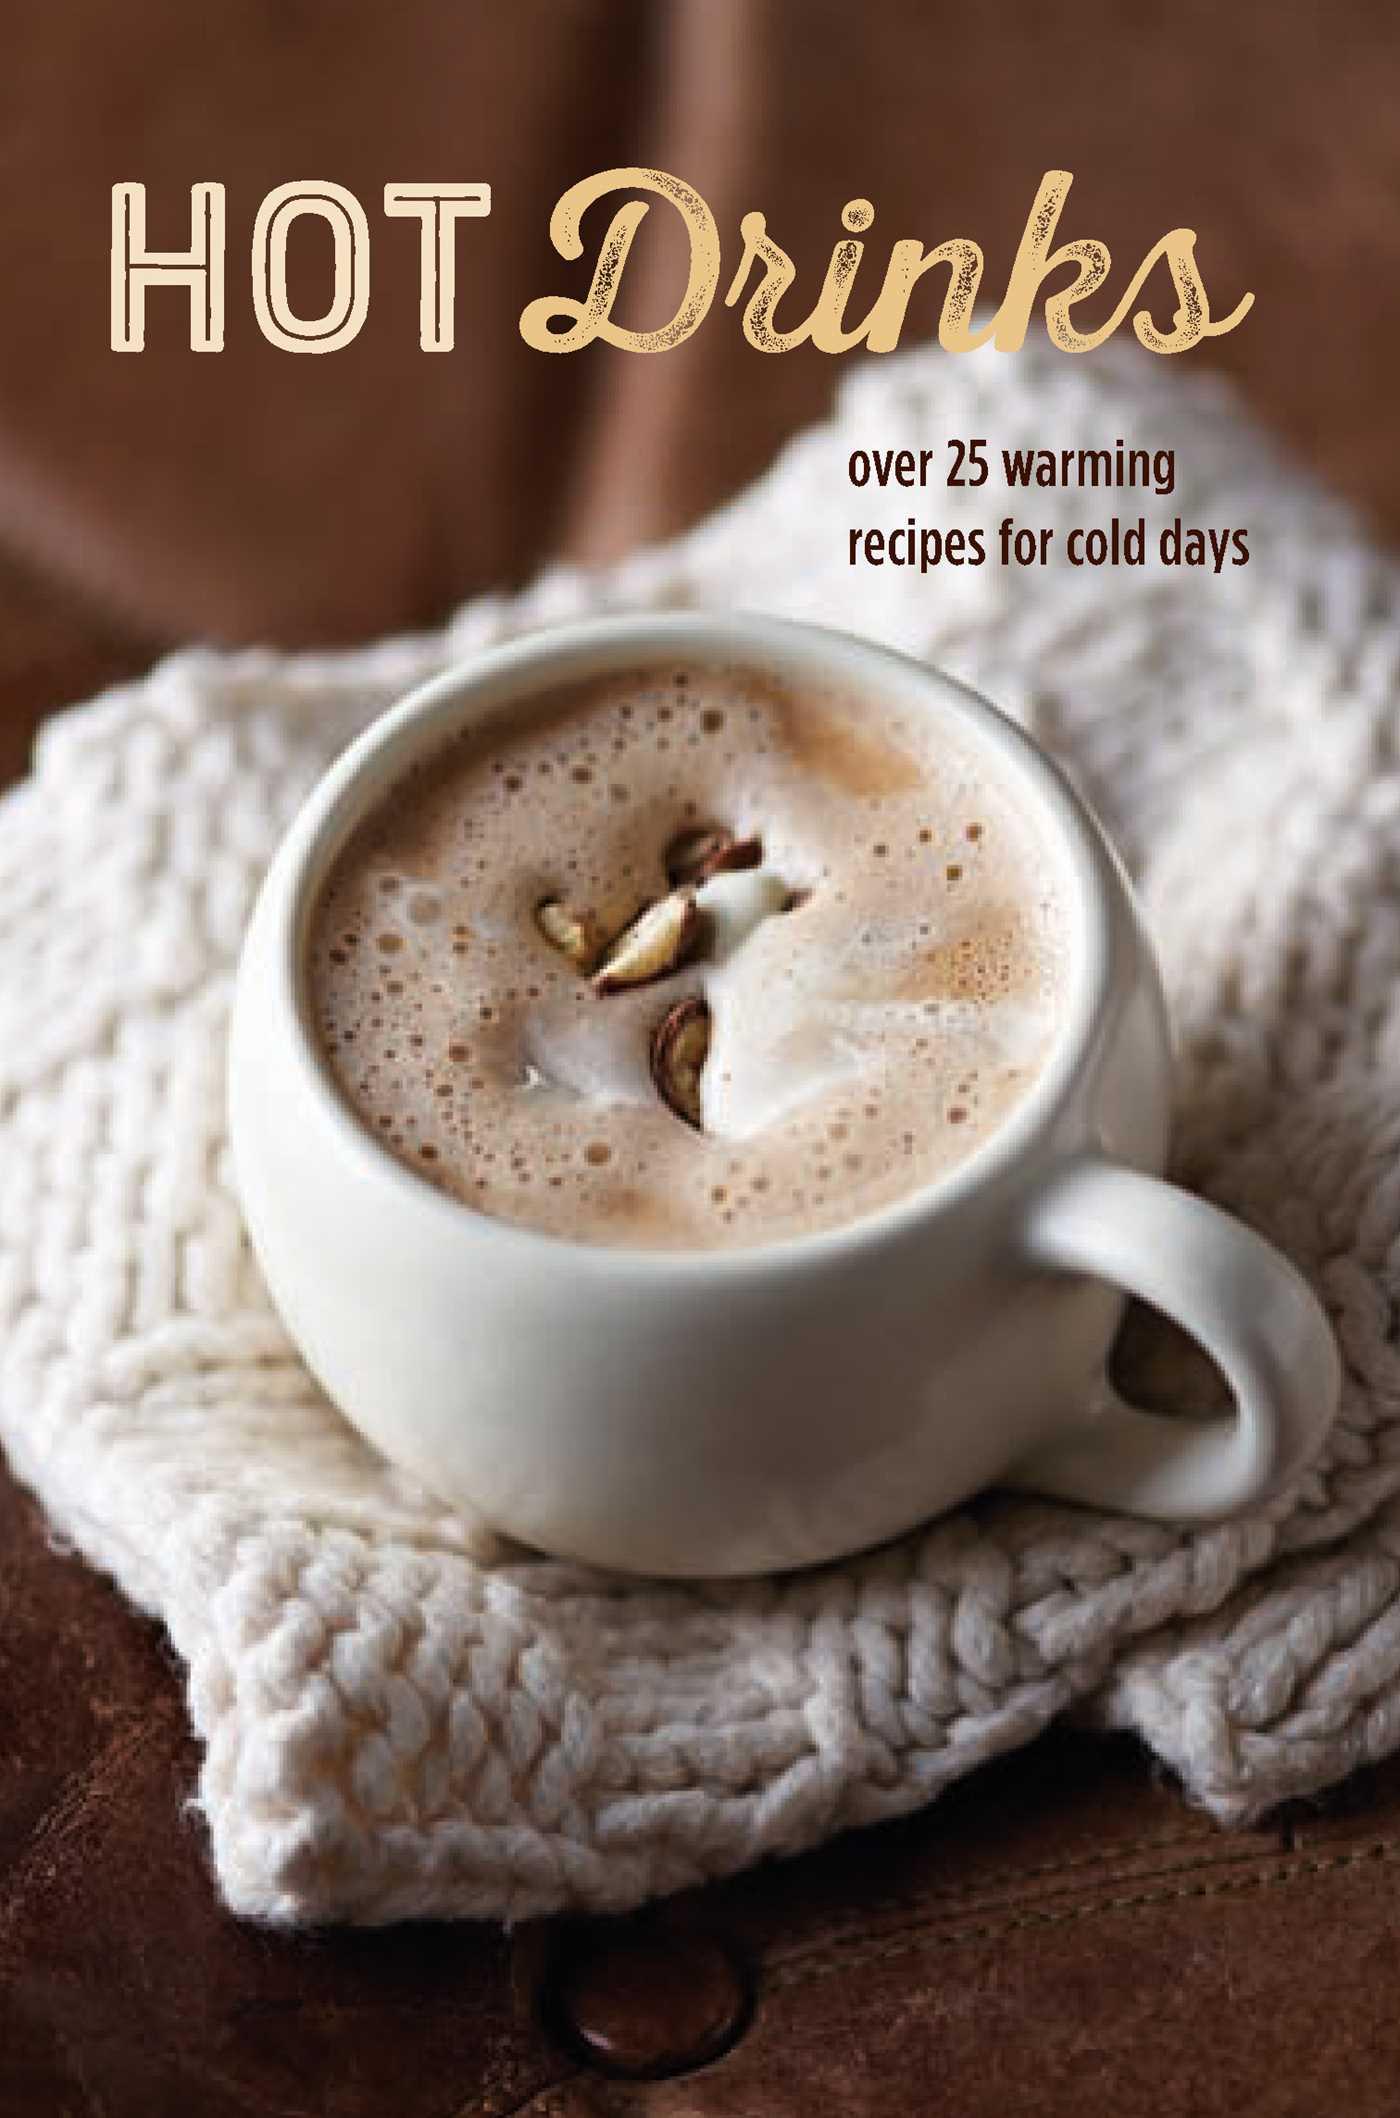 Hot drinks 9781849758963 hr